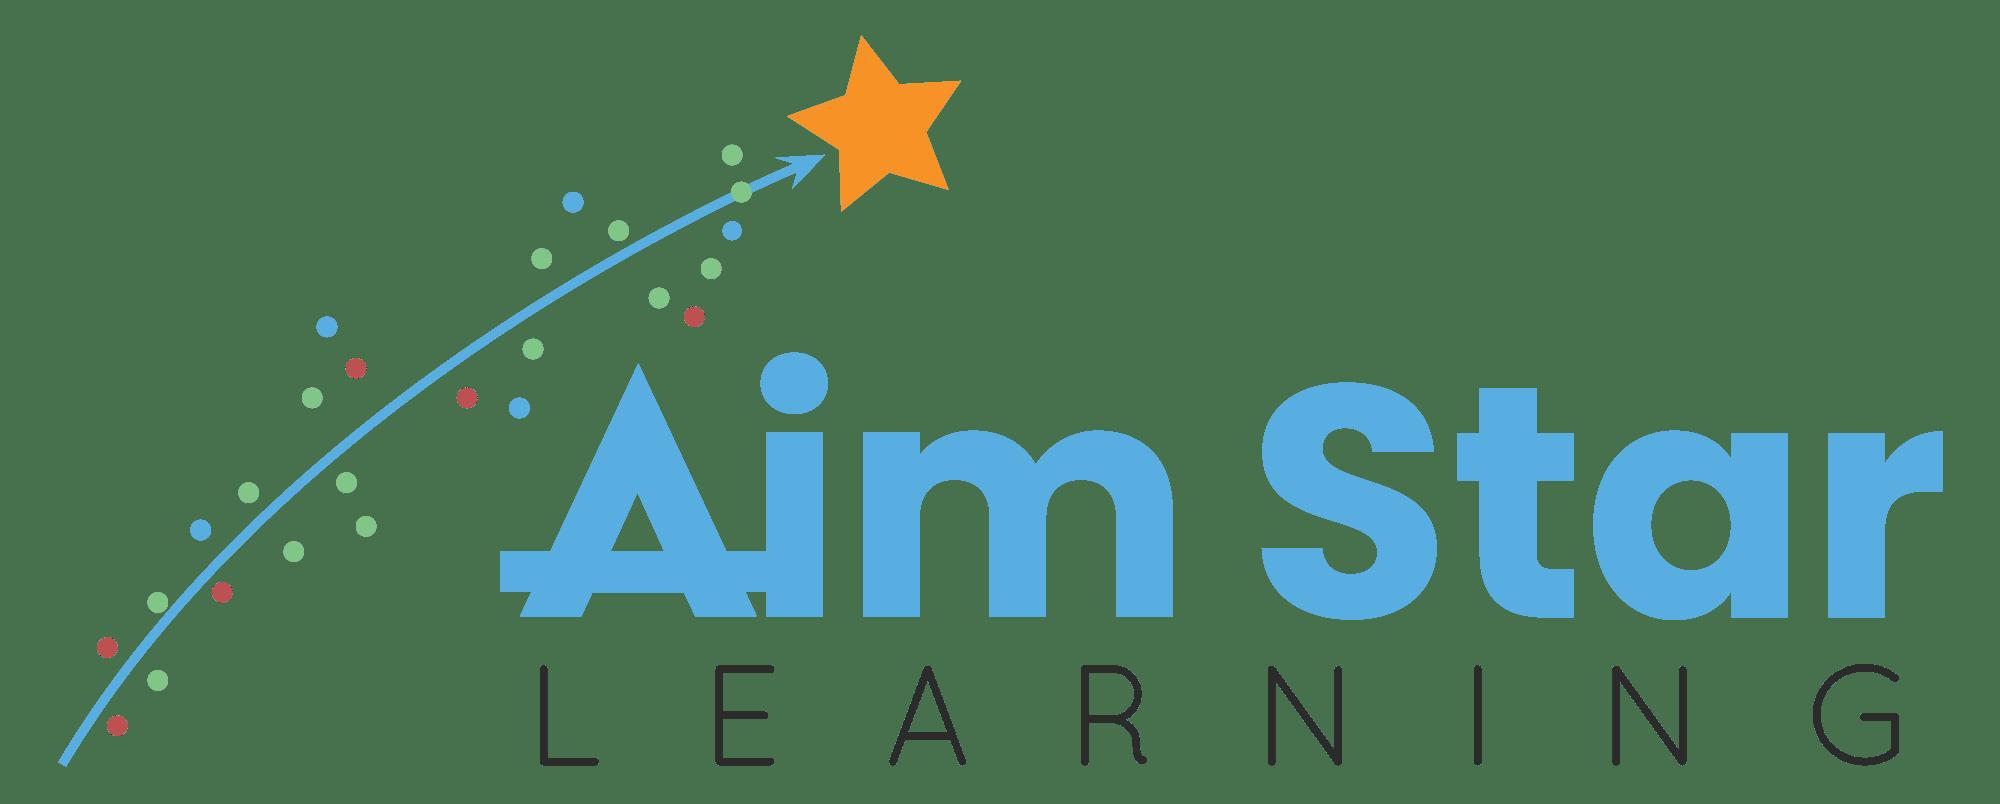 37787757_Aim-Star-Learning_FINAL